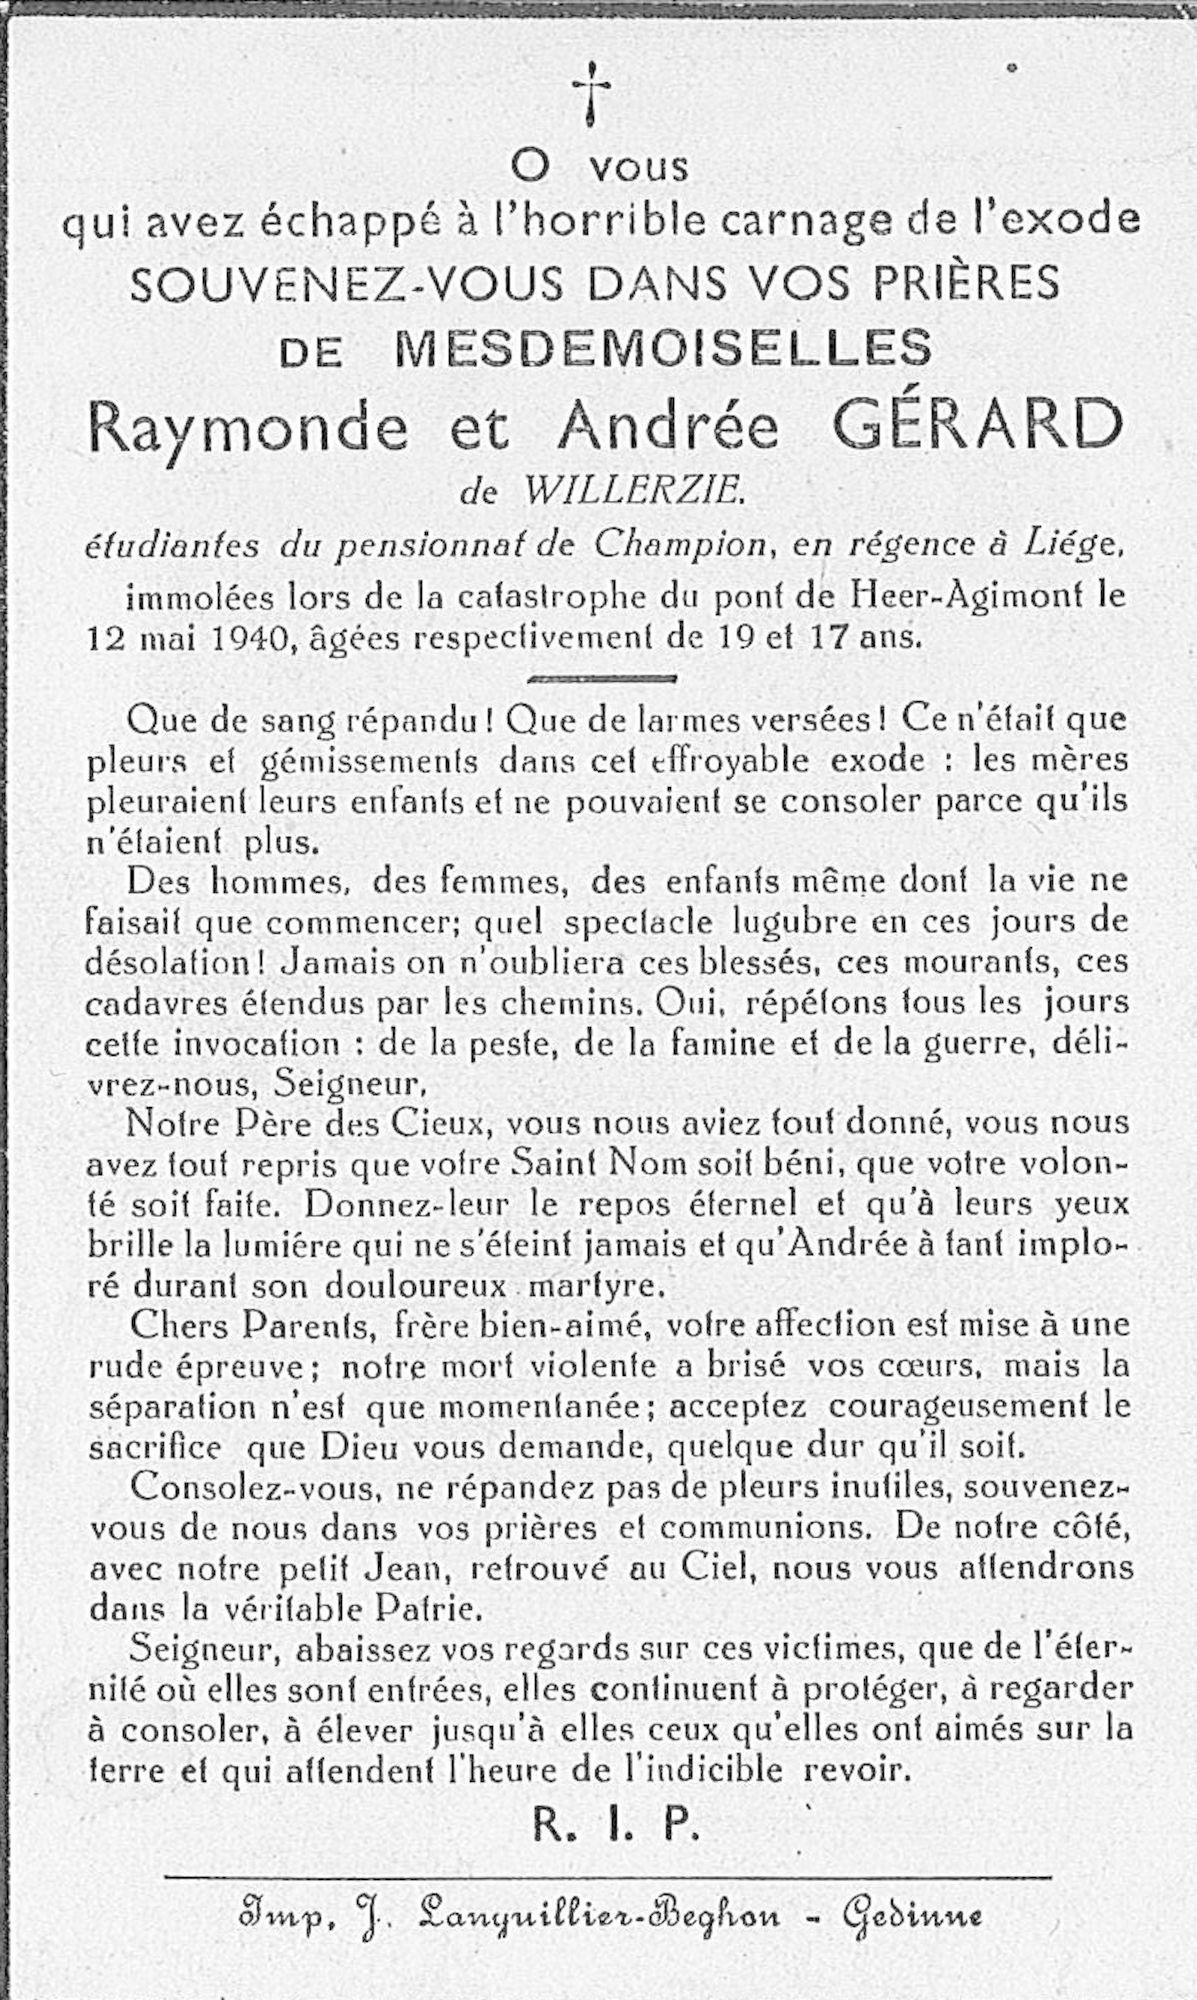 Andrée Gérard de Willerzie